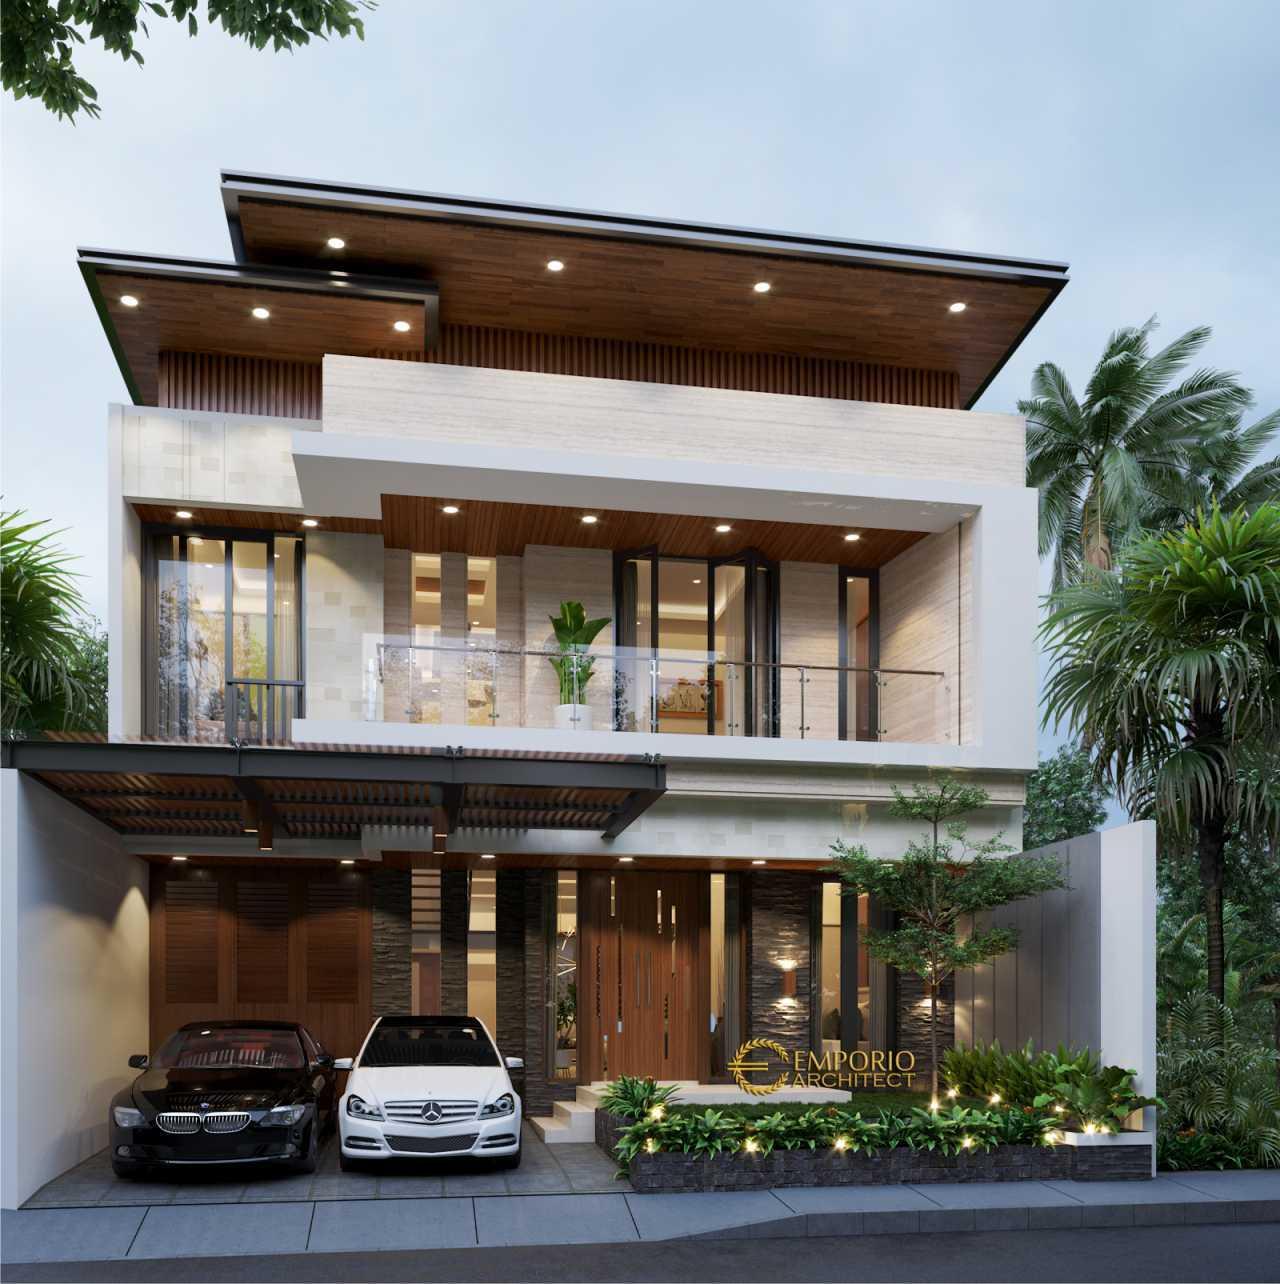 Emporio Architect Jasa Arsitek Jakarta Timur Desain Rumah Modern 2 Lantai 625 @ Jakarta Timur Jakarta Timur, Kota Jakarta Timur, Daerah Khusus Ibukota Jakarta, Indonesia Jakarta Timur, Kota Jakarta Timur, Daerah Khusus Ibukota Jakarta, Indonesia Emporio-Architect-Jasa-Arsitek-Jakarta-Timur-Desain-Rumah-Modern-2-Lantai-625-Jakarta-Timur Modern  92905